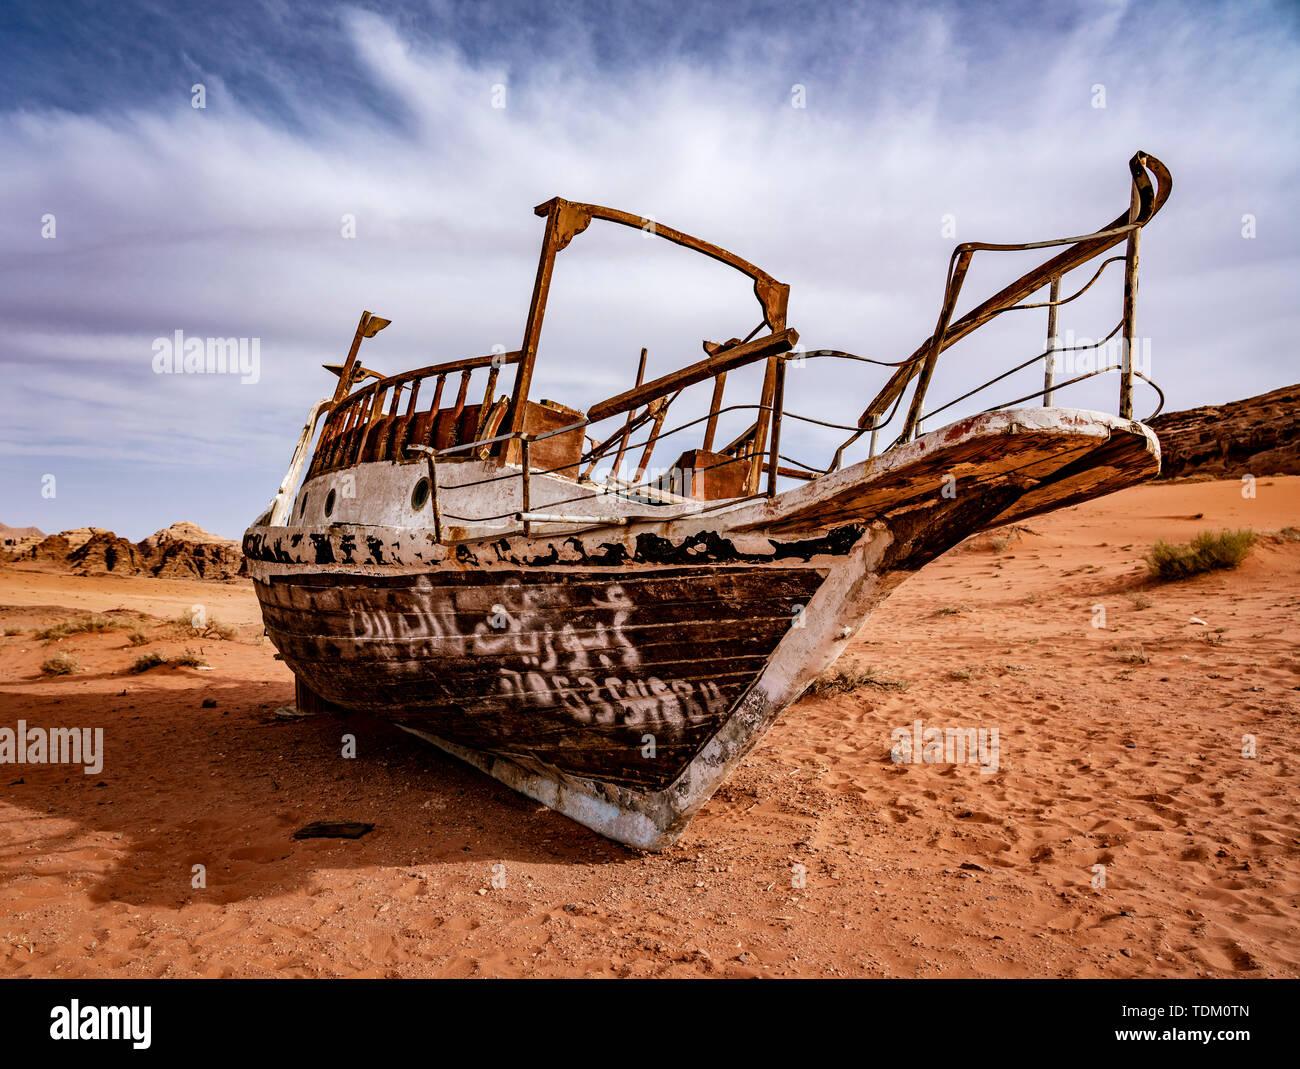 Strange Boat Stuck on Sand Hundres of KM From Nearest Water in Wadi Rum Jordan. Stock Photo